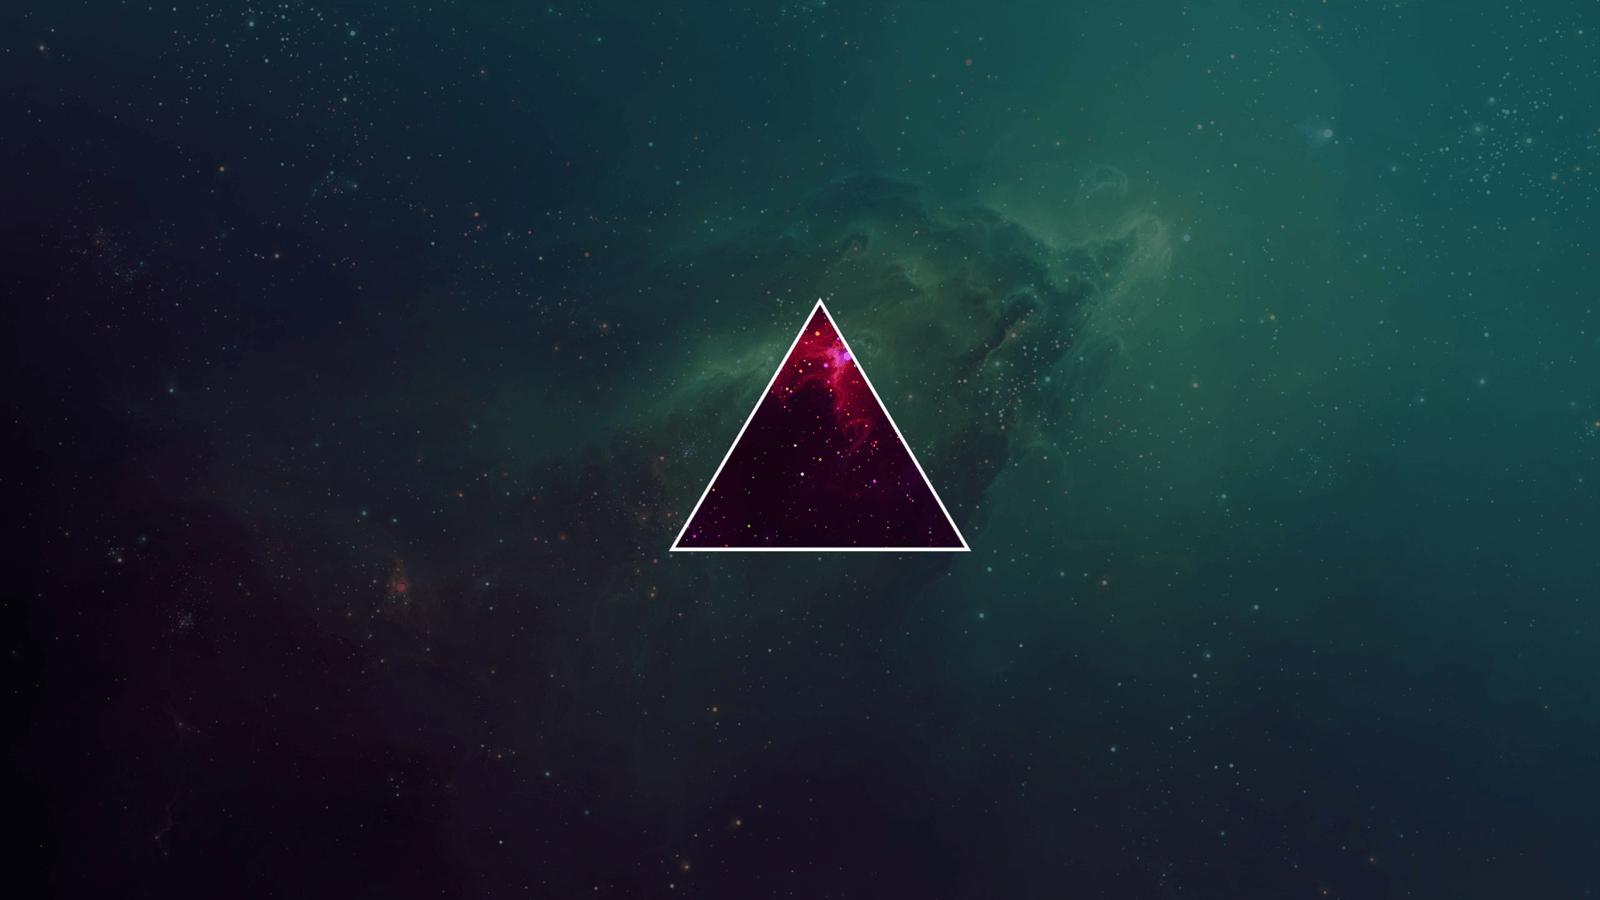 applife-wallpaper-minimalism14